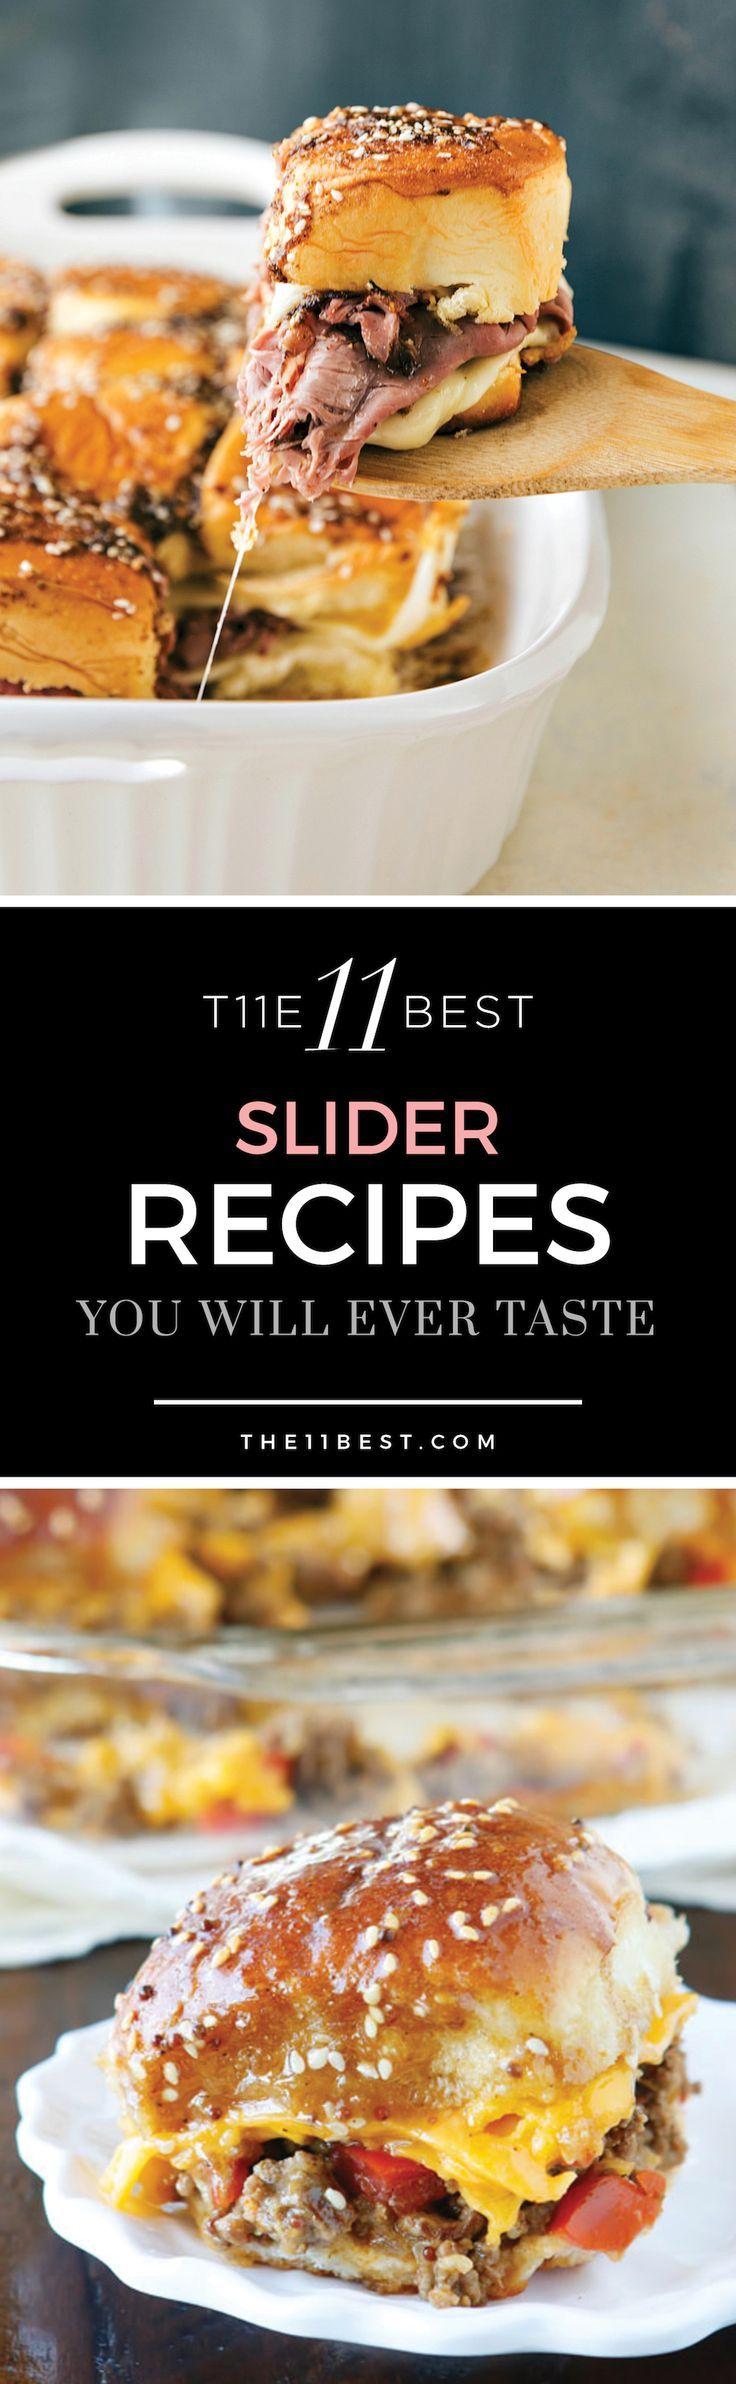 Best 20+ Anniversary dinner recipes ideas on Pinterest ...